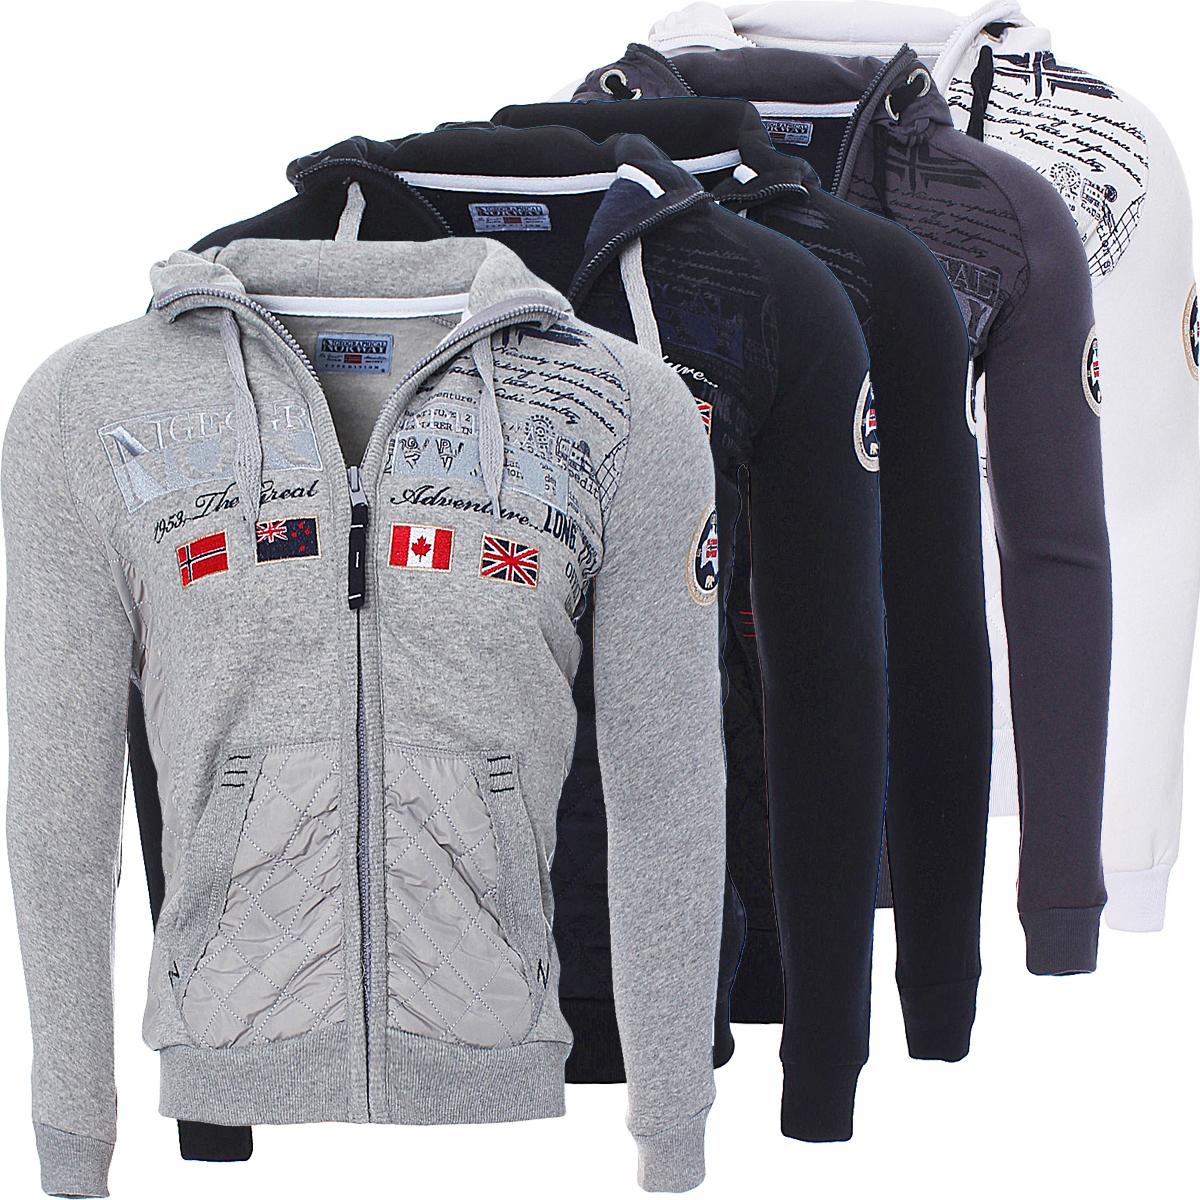 Geographical Norway Men/'s Golfstream Winter Jacket Sweatshirt Pullover Polo